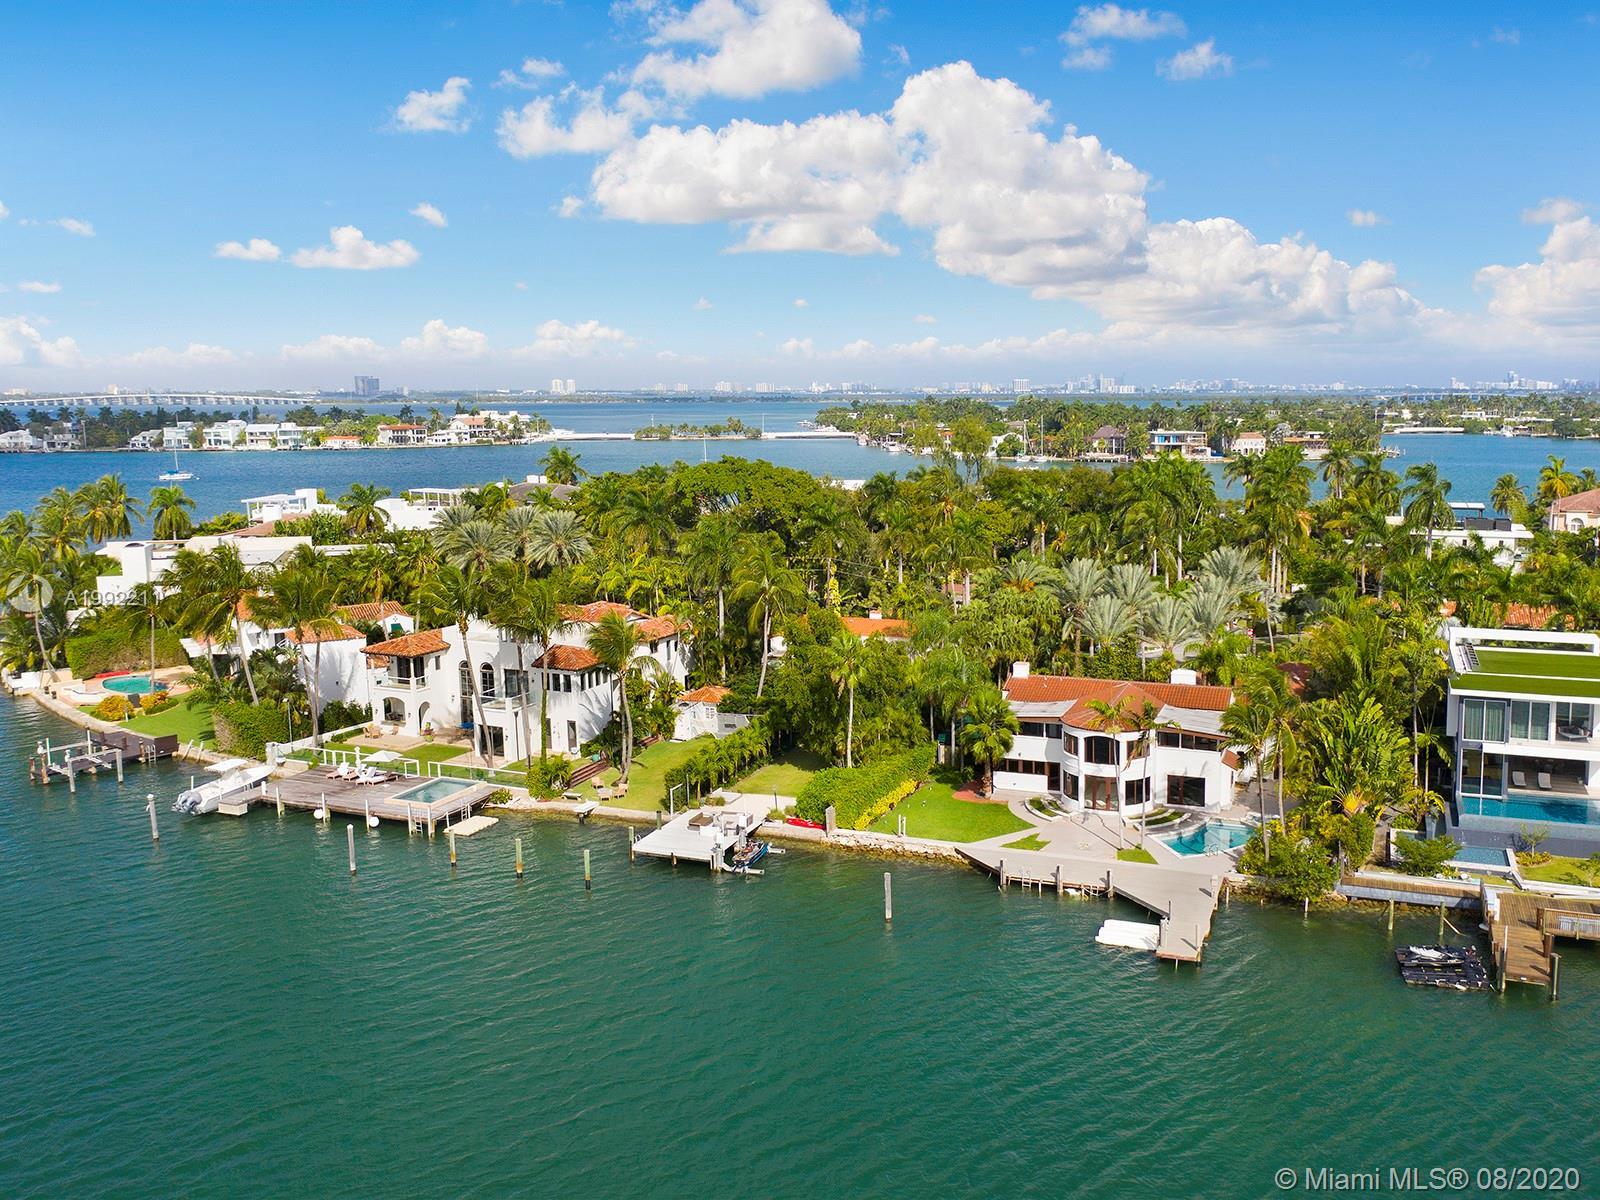 Photo - 394 S HIBISCUS DR, Miami Beach FL 33139